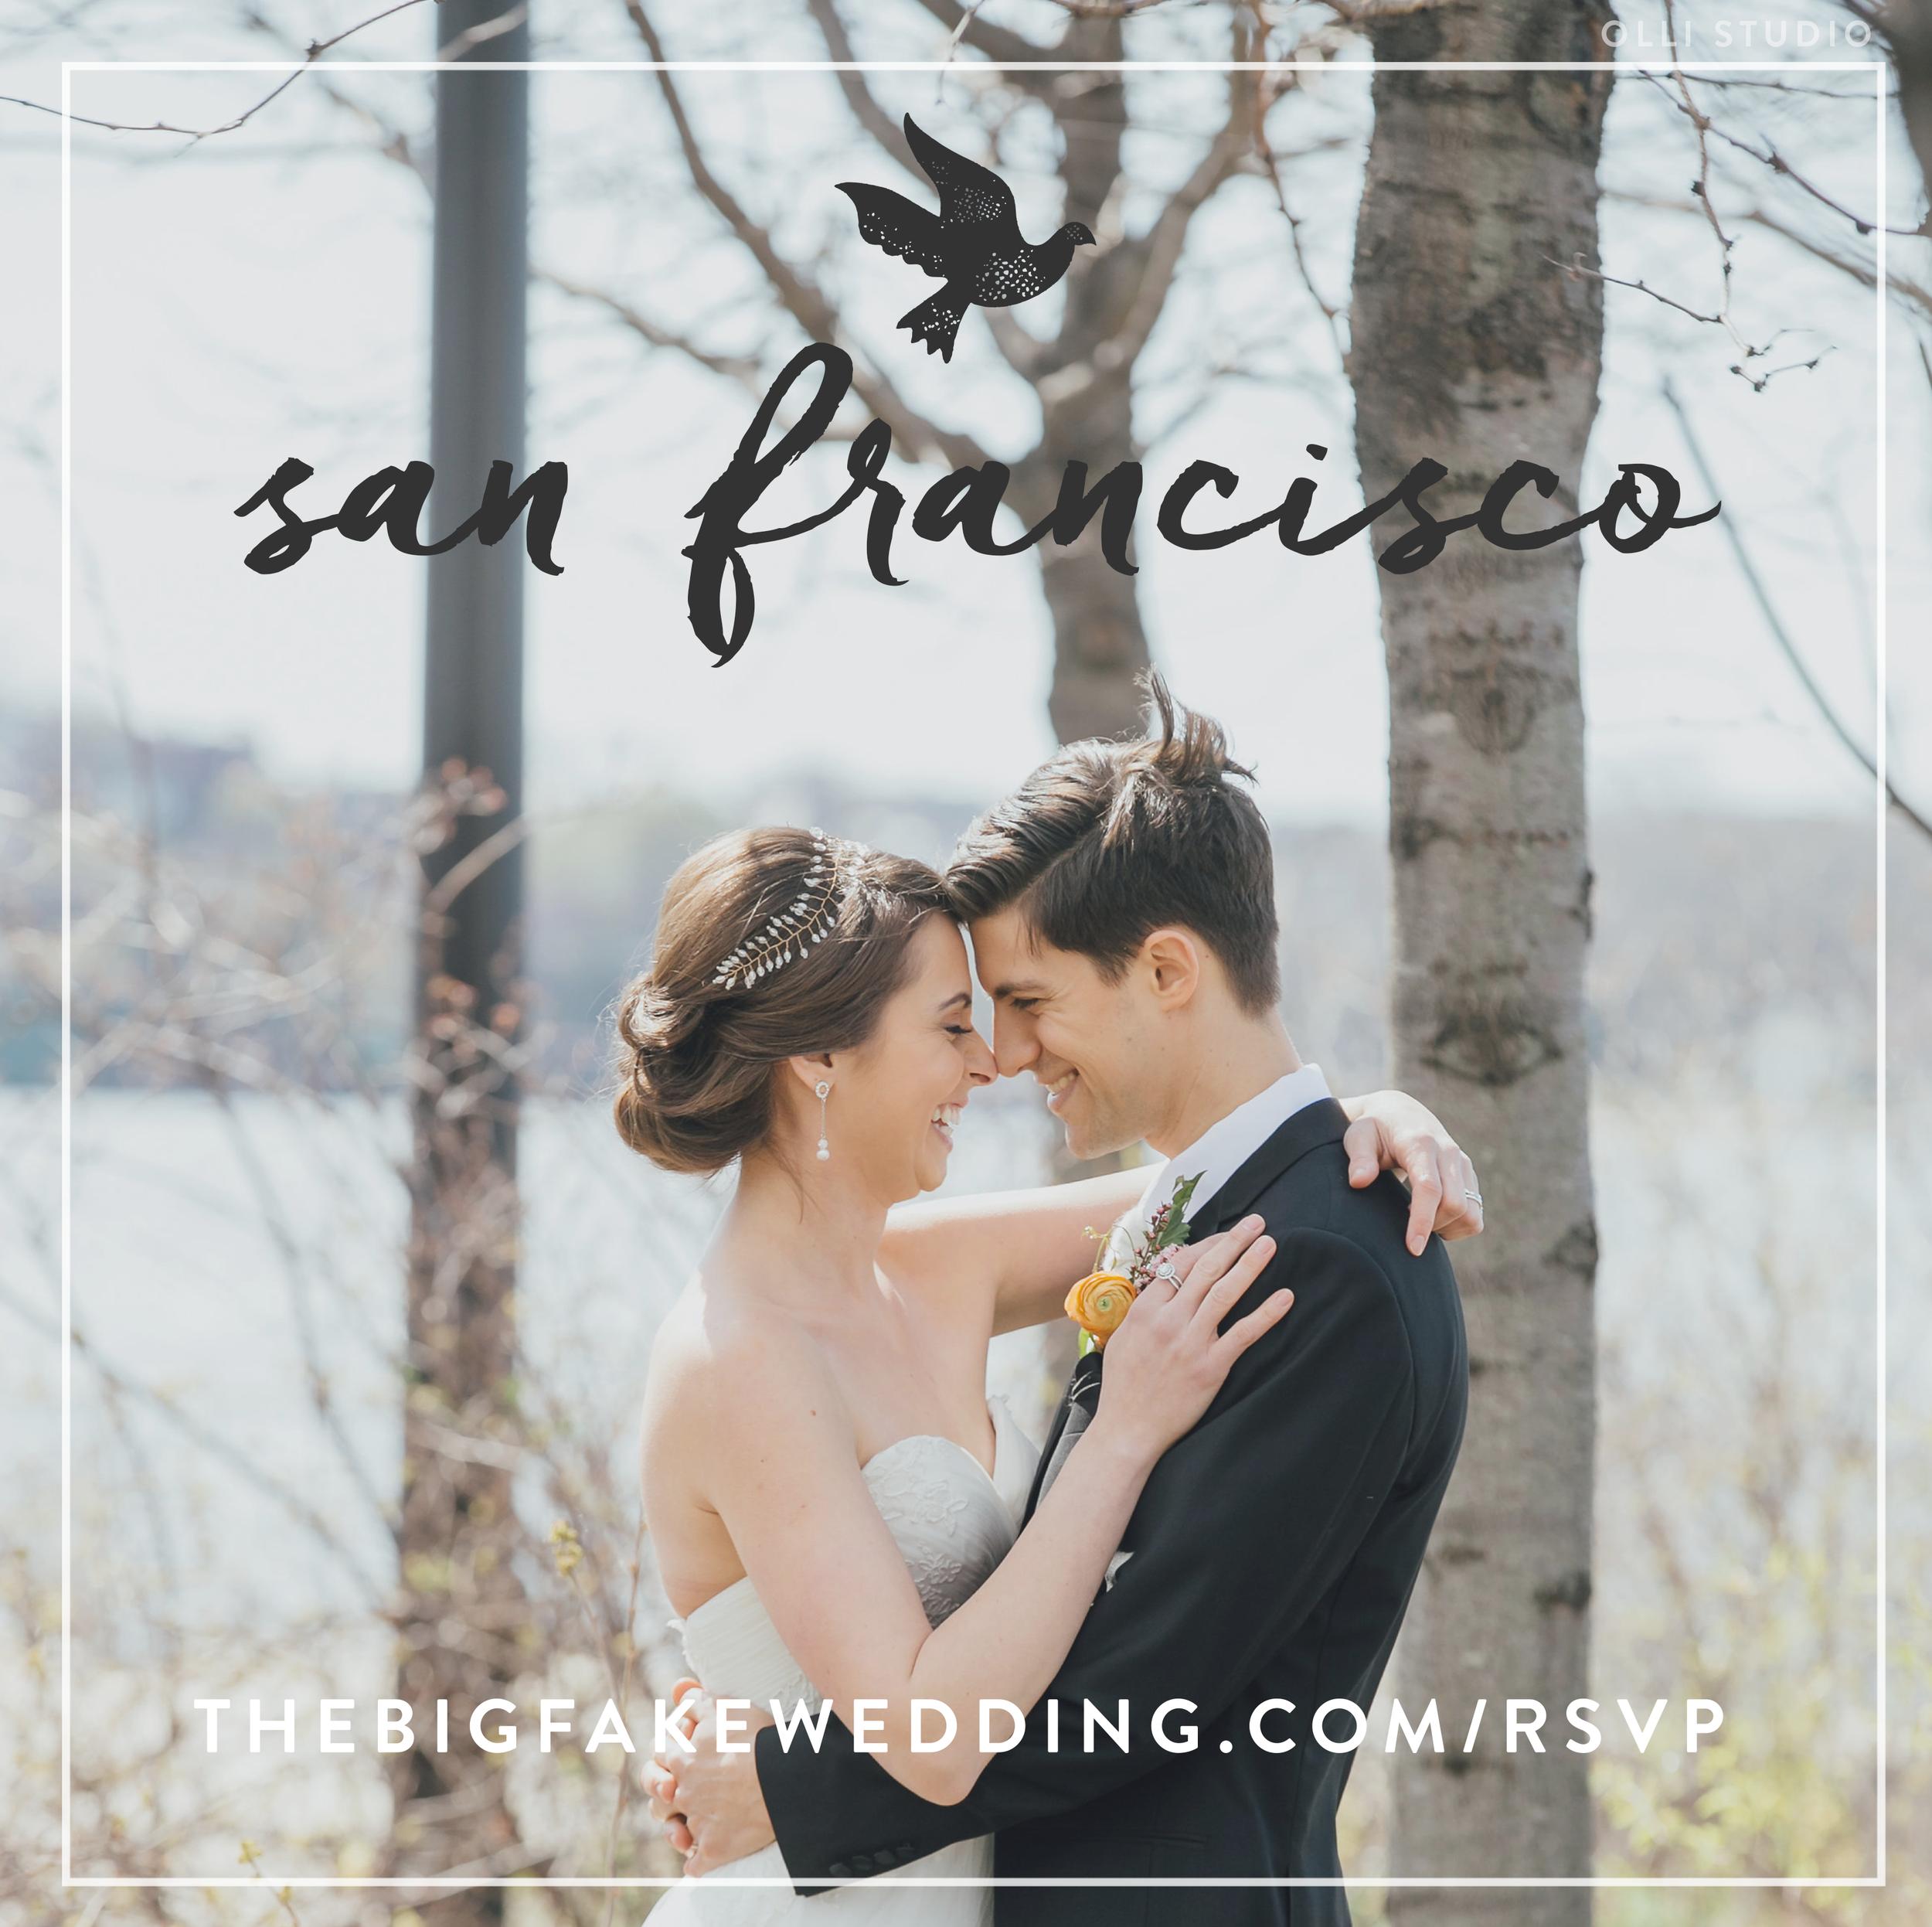 San-Francisco_CityPromo.png